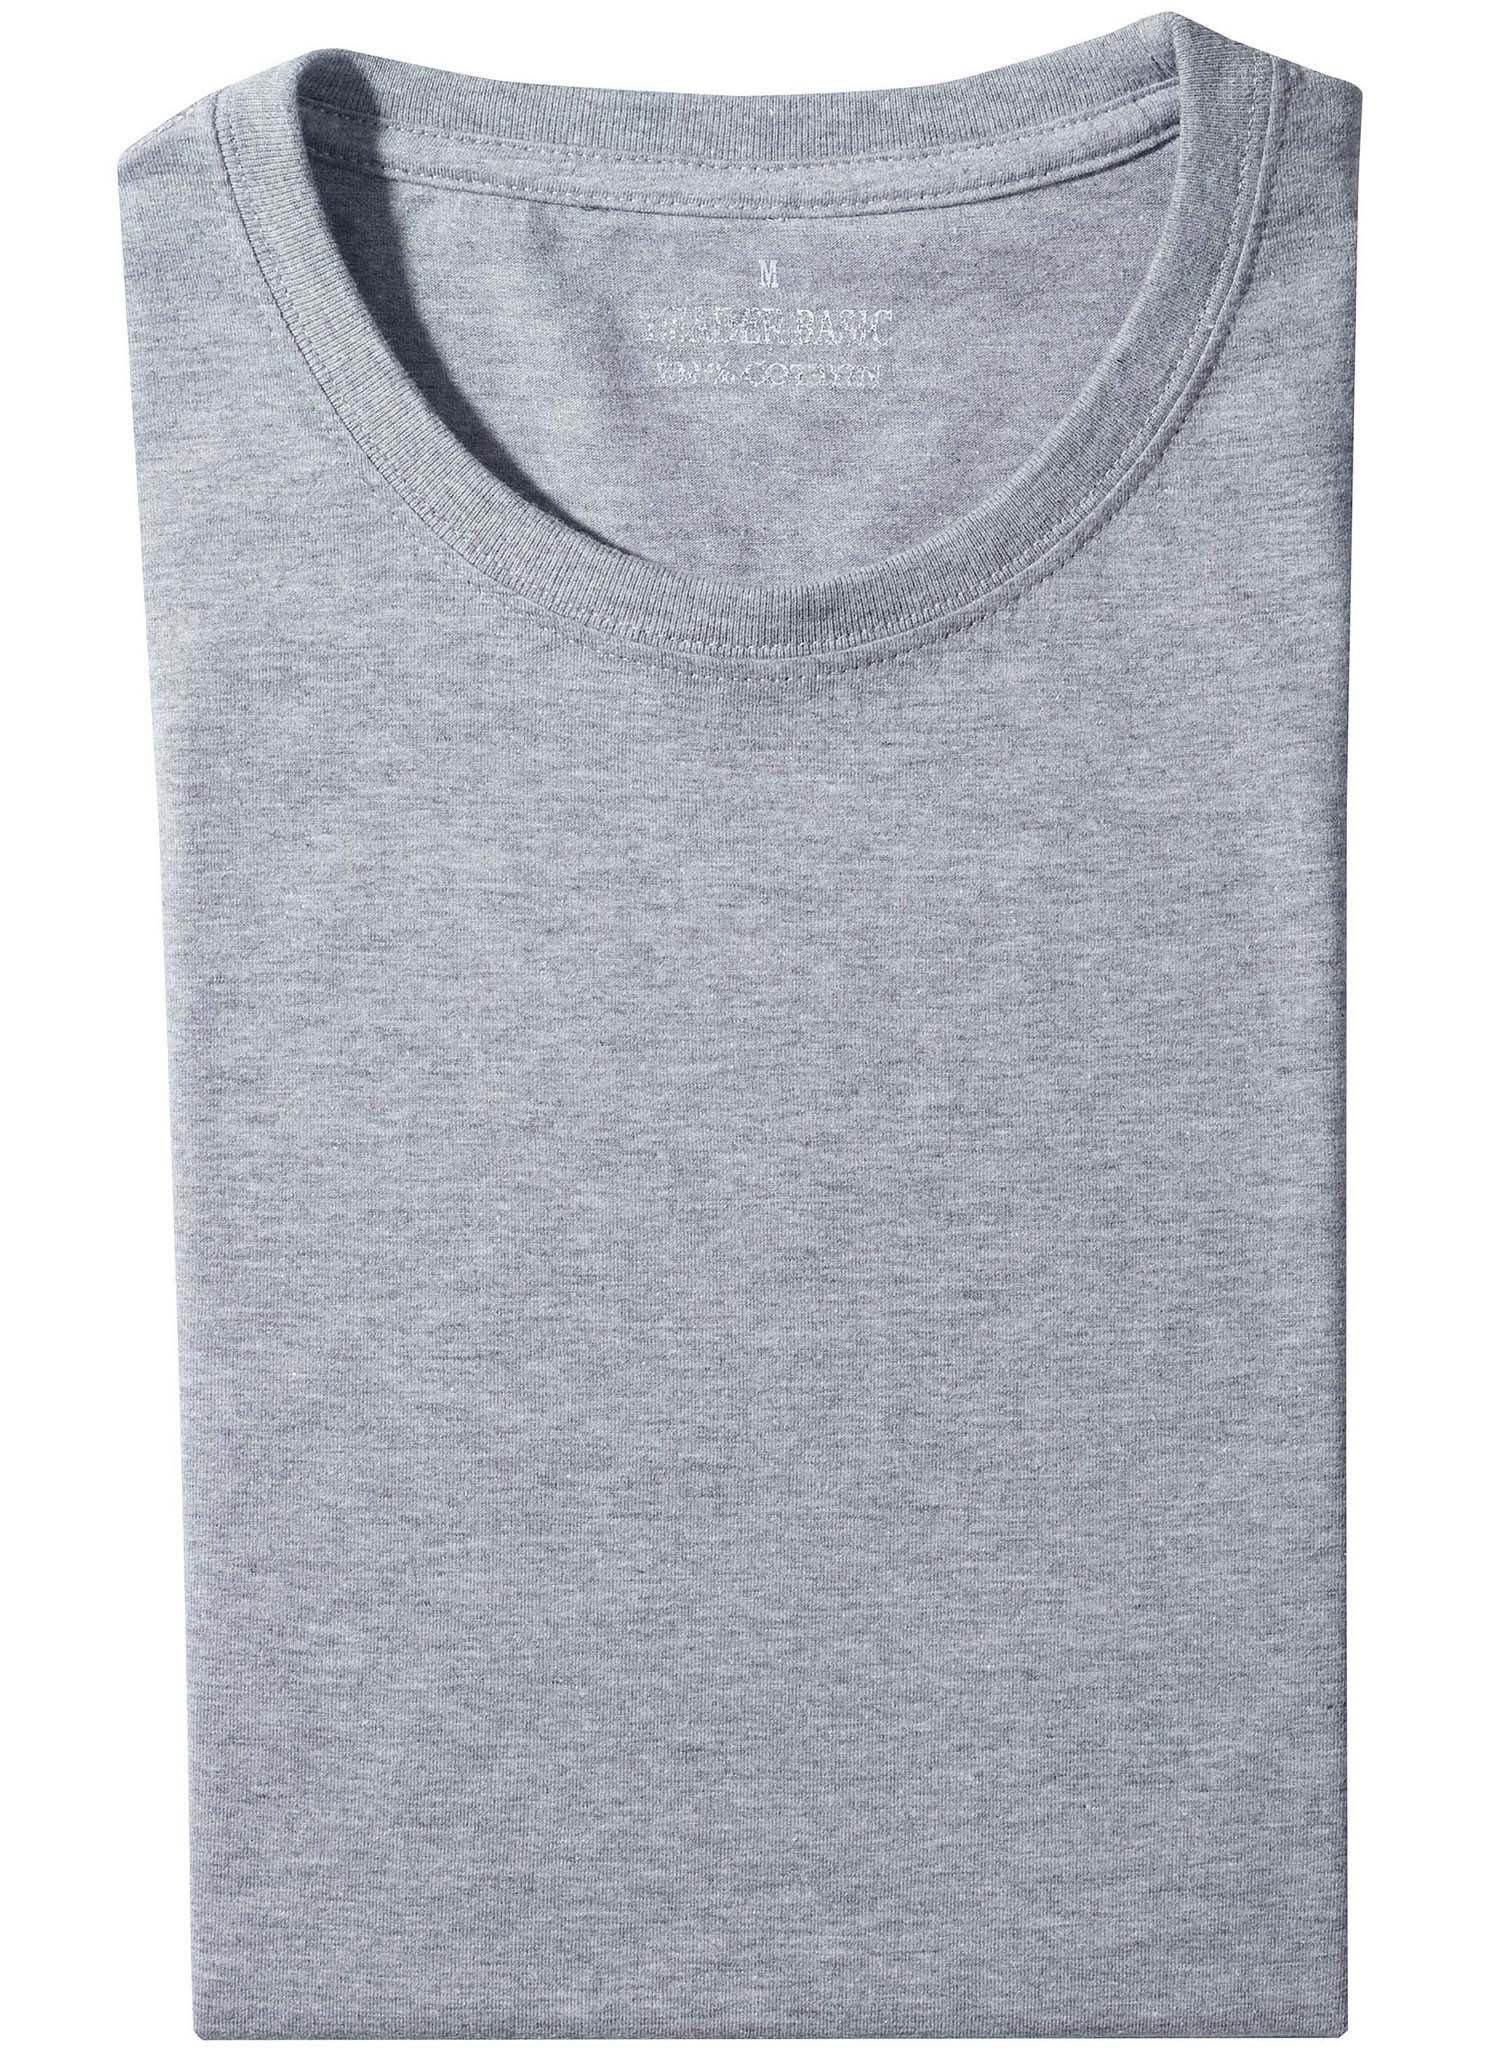 U-Duo-Pack-Shirt grau mel. XXXL 004 - 1 - Ronja.ch